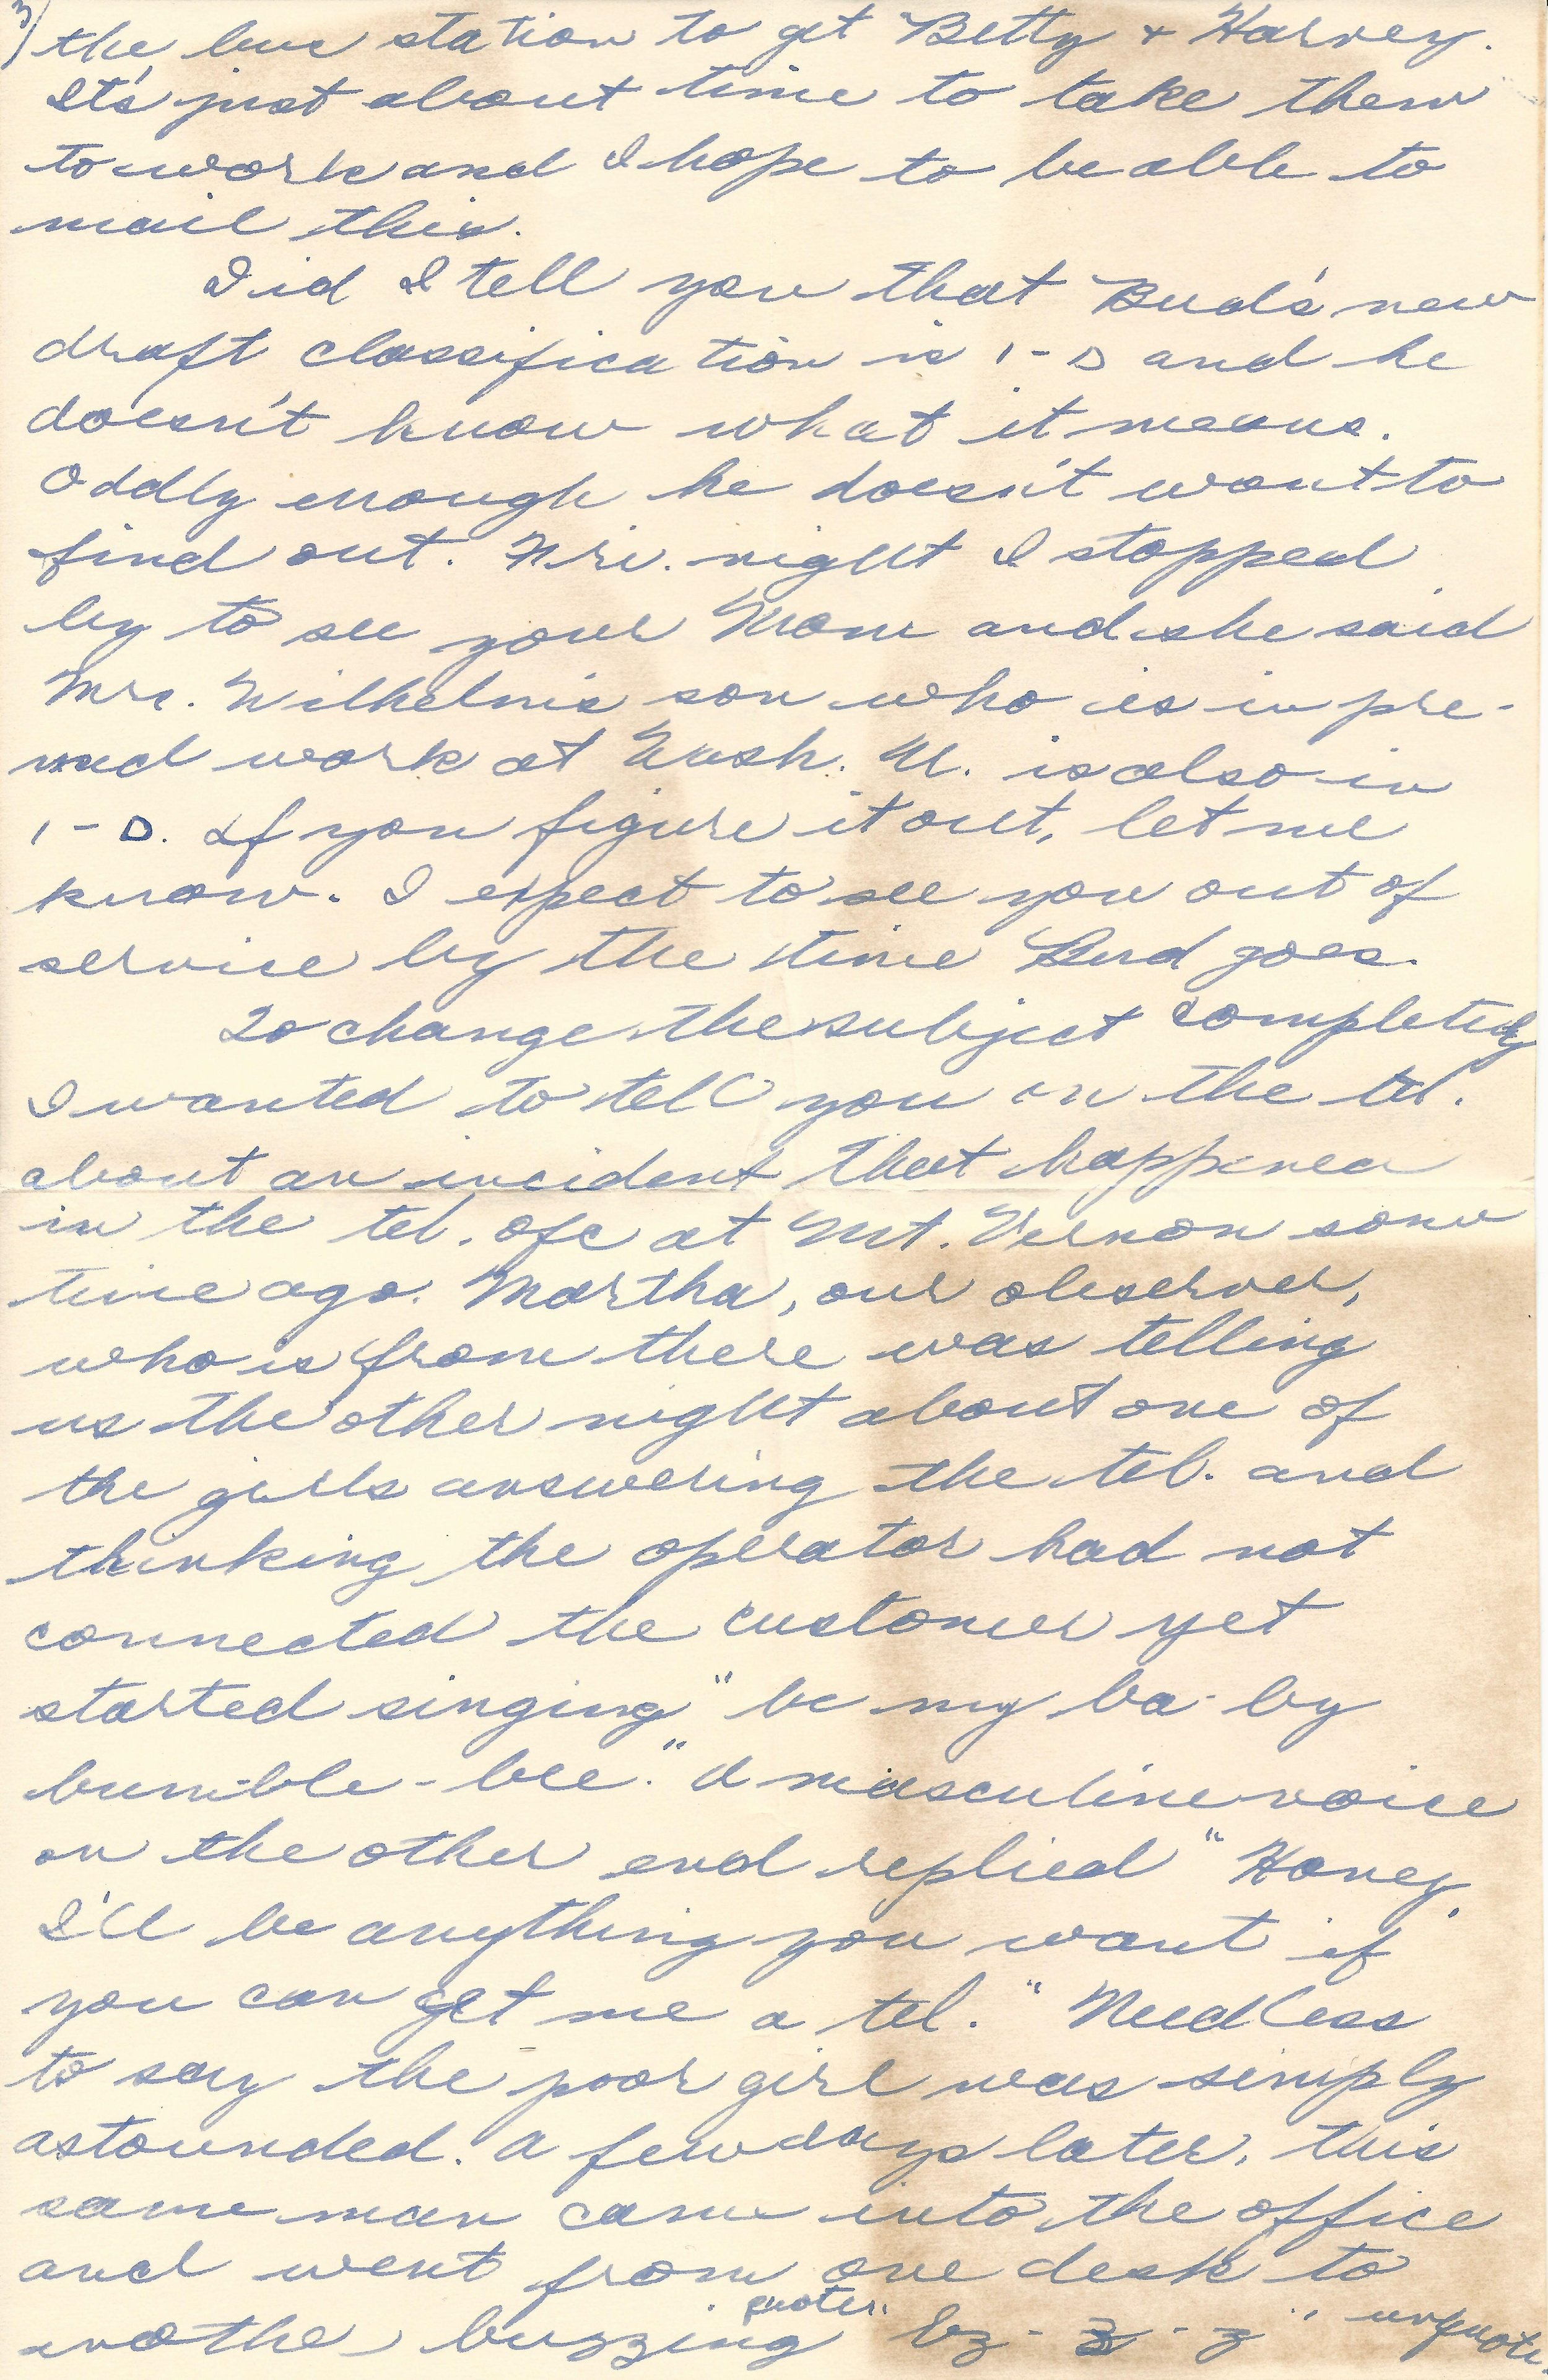 5. Nov. 8, 1952 (Oma)_Page_4.jpg